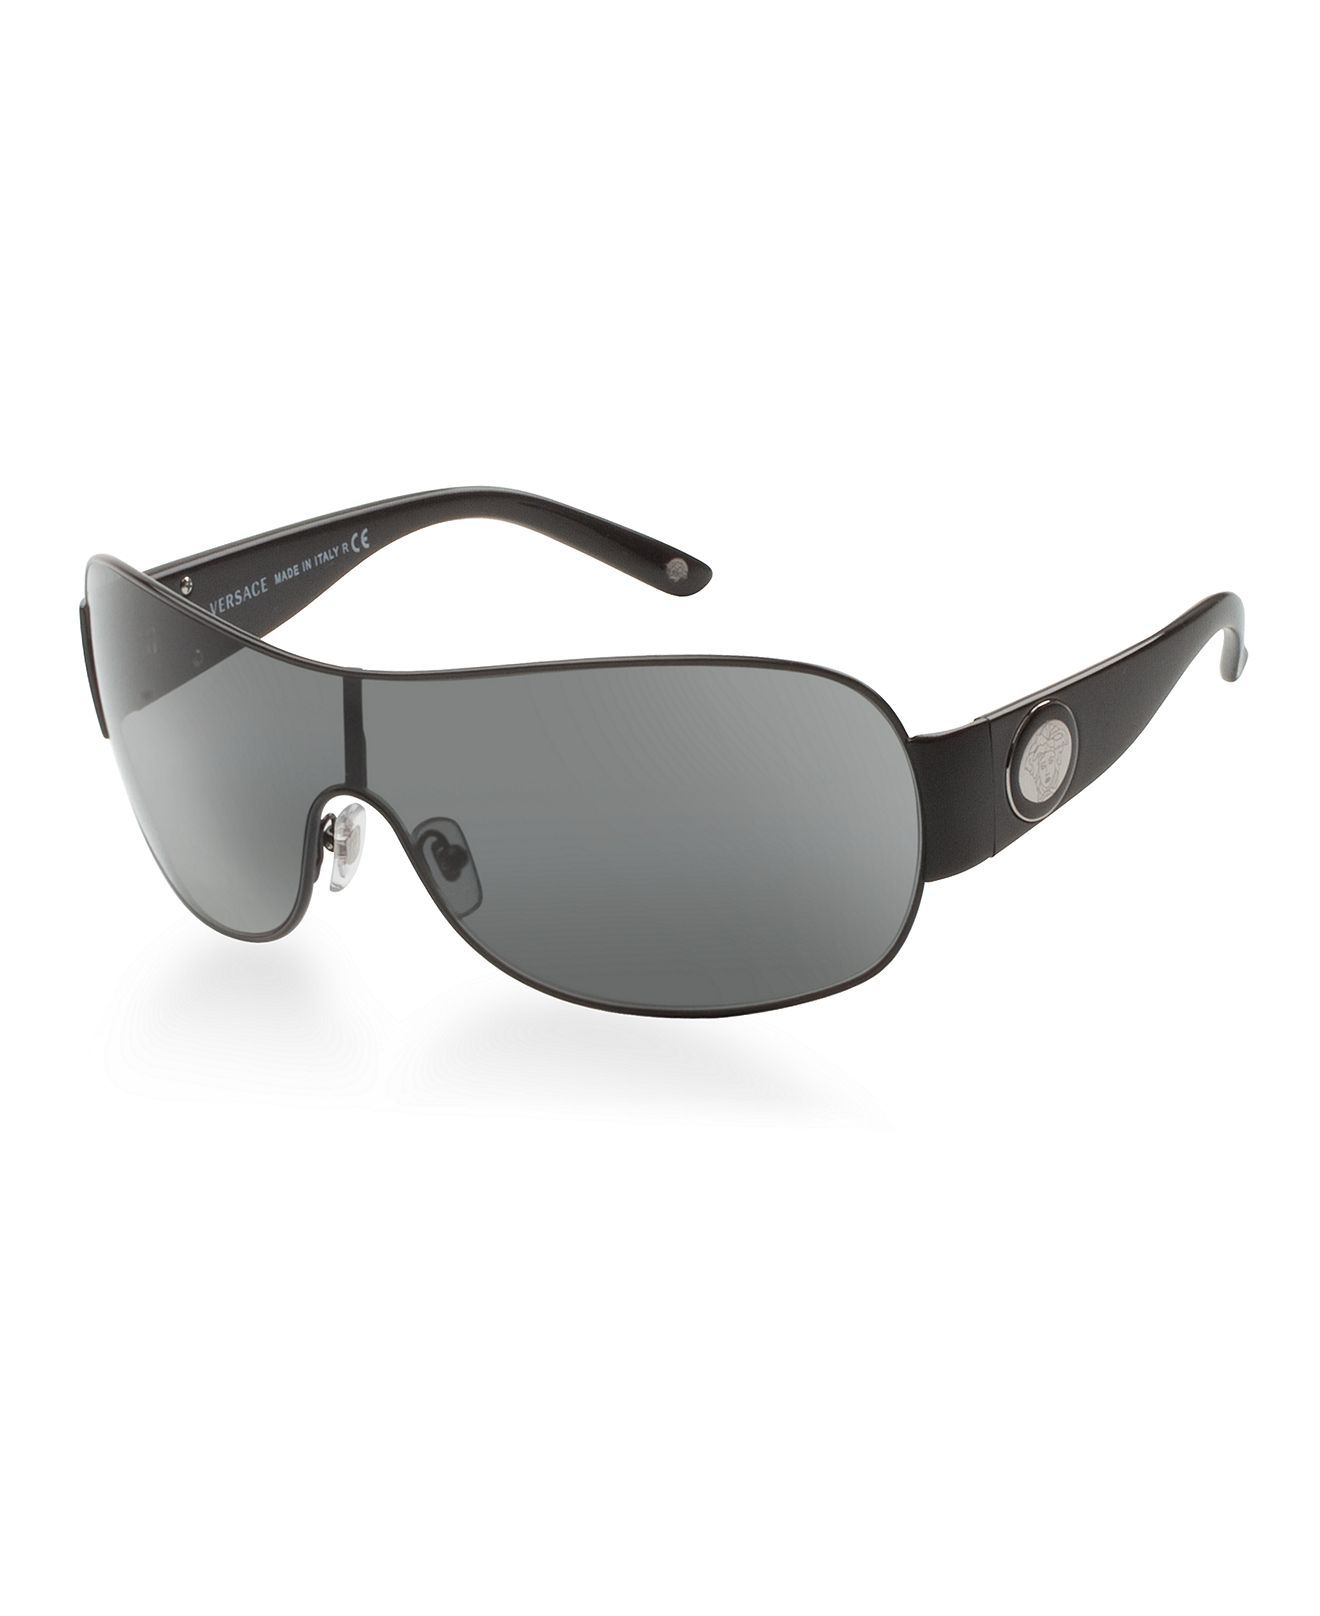 Versace Sunglasses, VE2101 - Sunglasses - Handbags & Accessories - Macy's